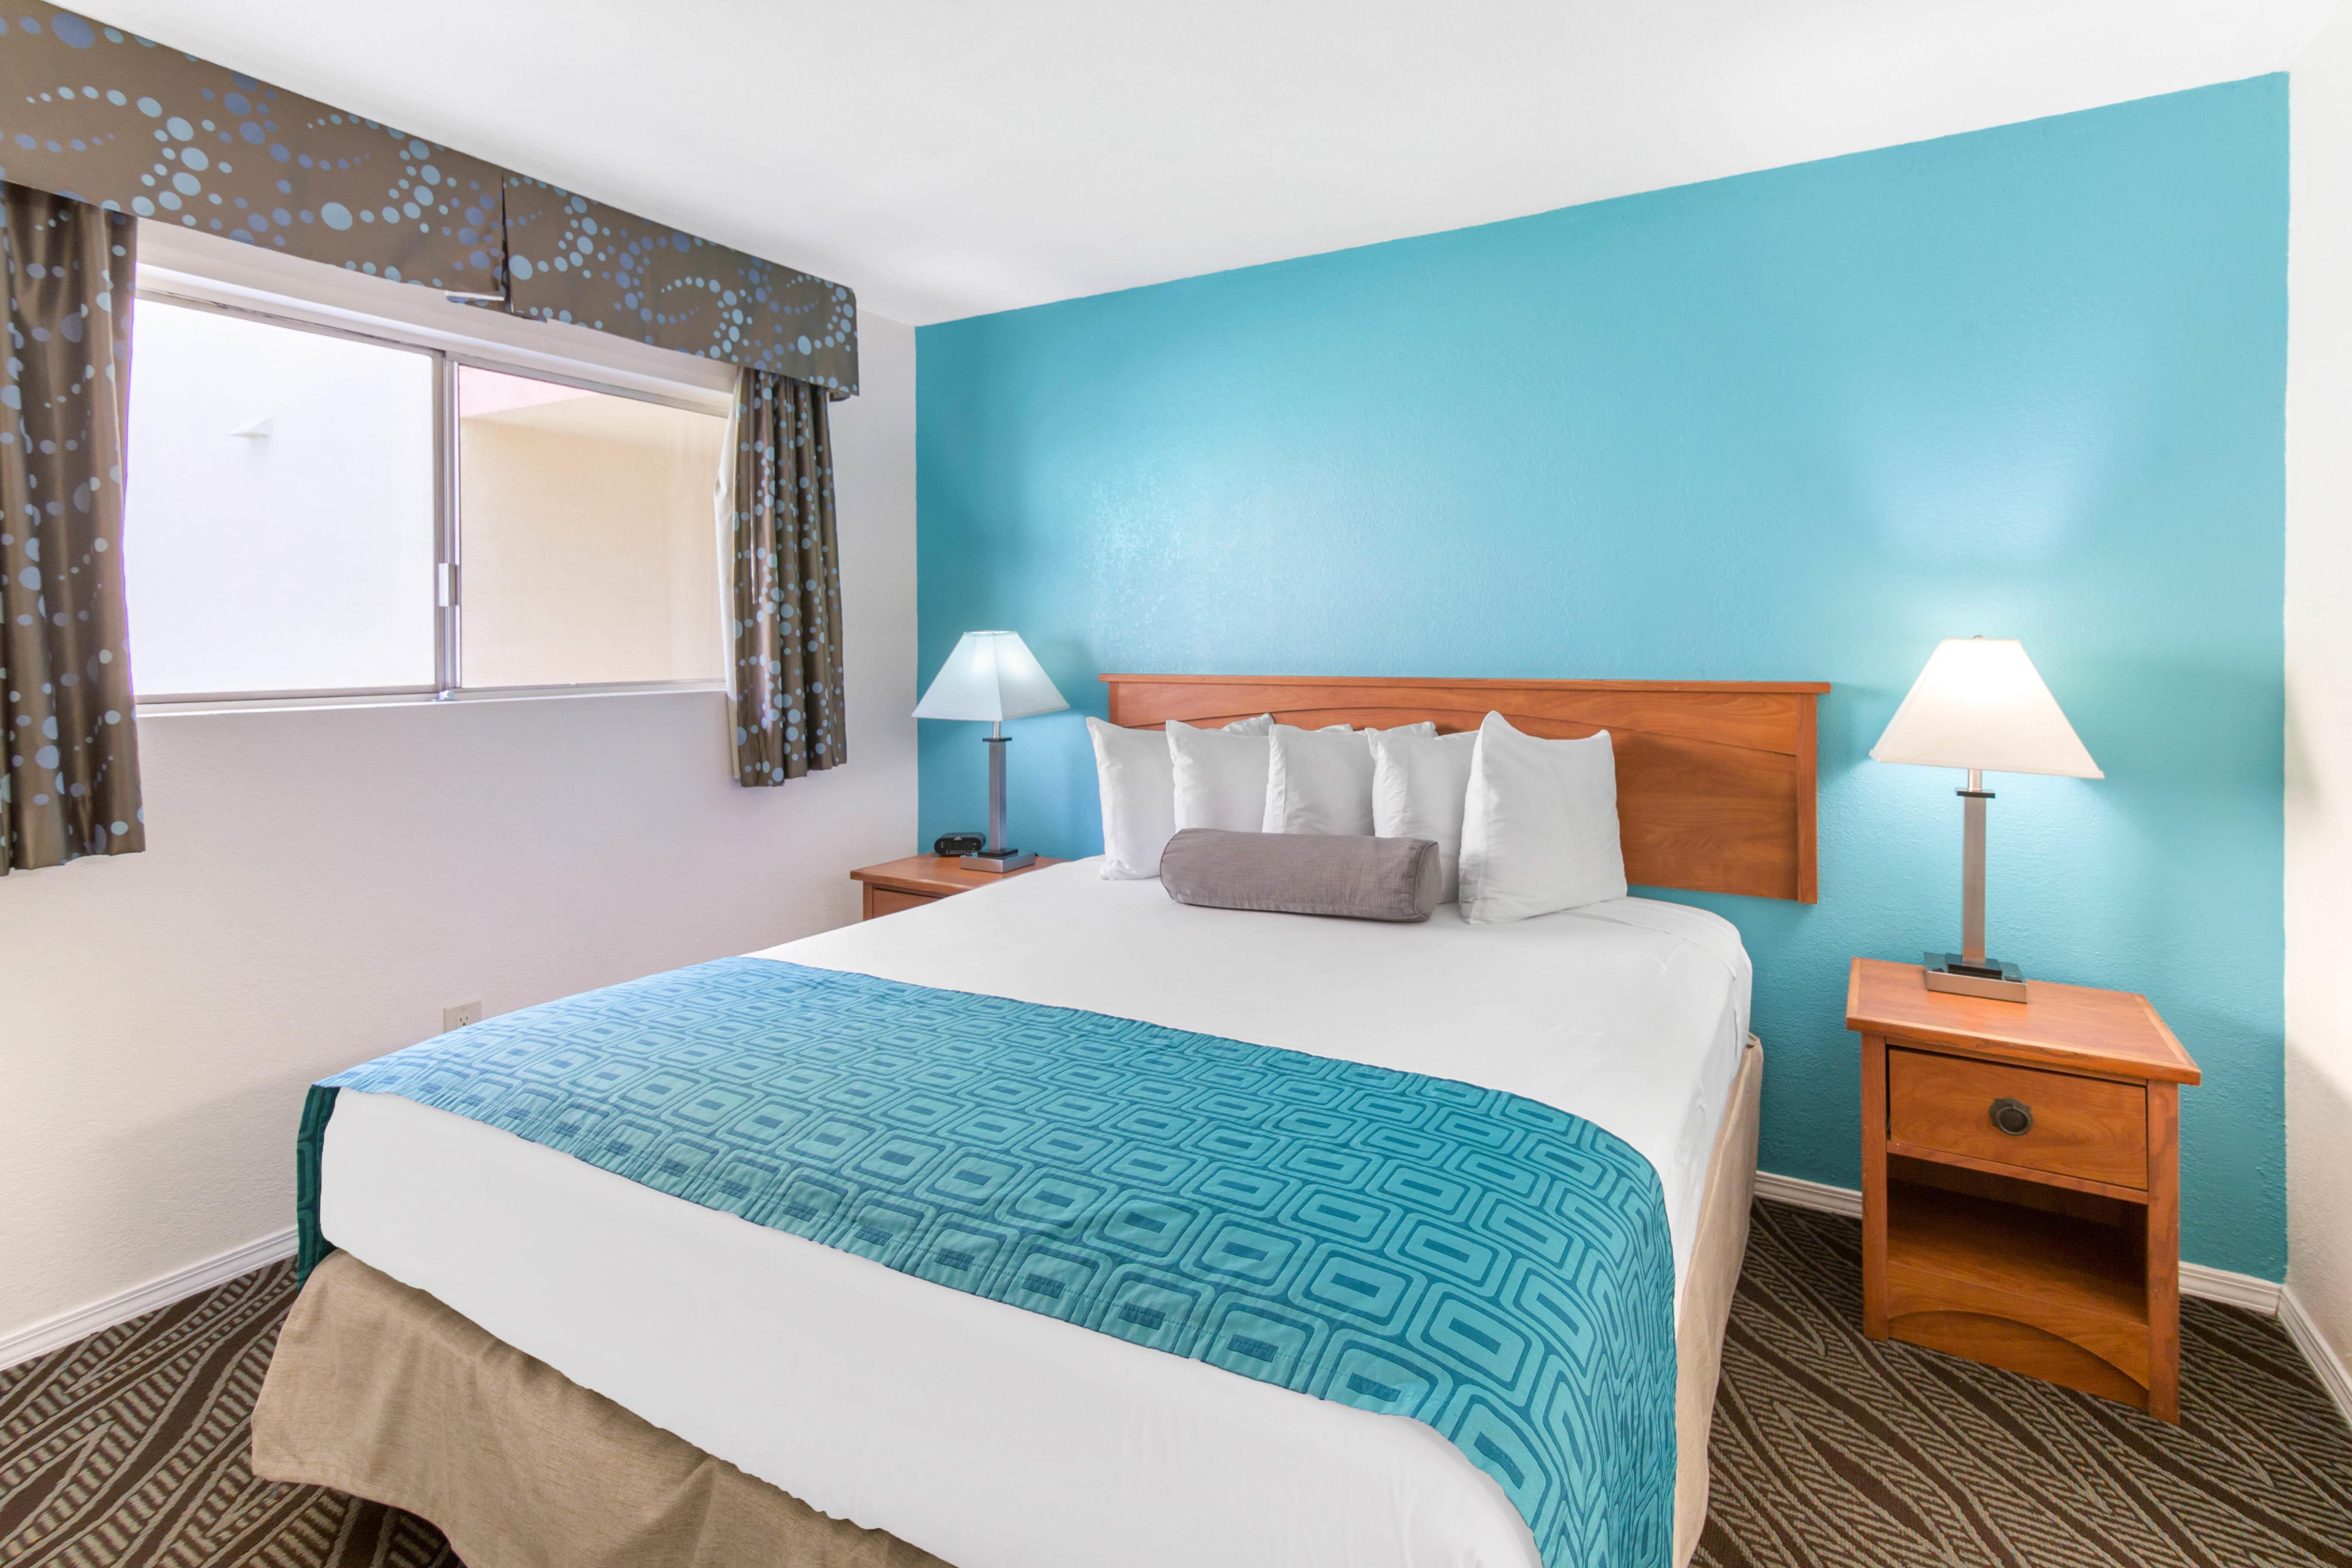 Howard Johnson by Wyndham Chula Vista San Diego Suite Hotel image 7